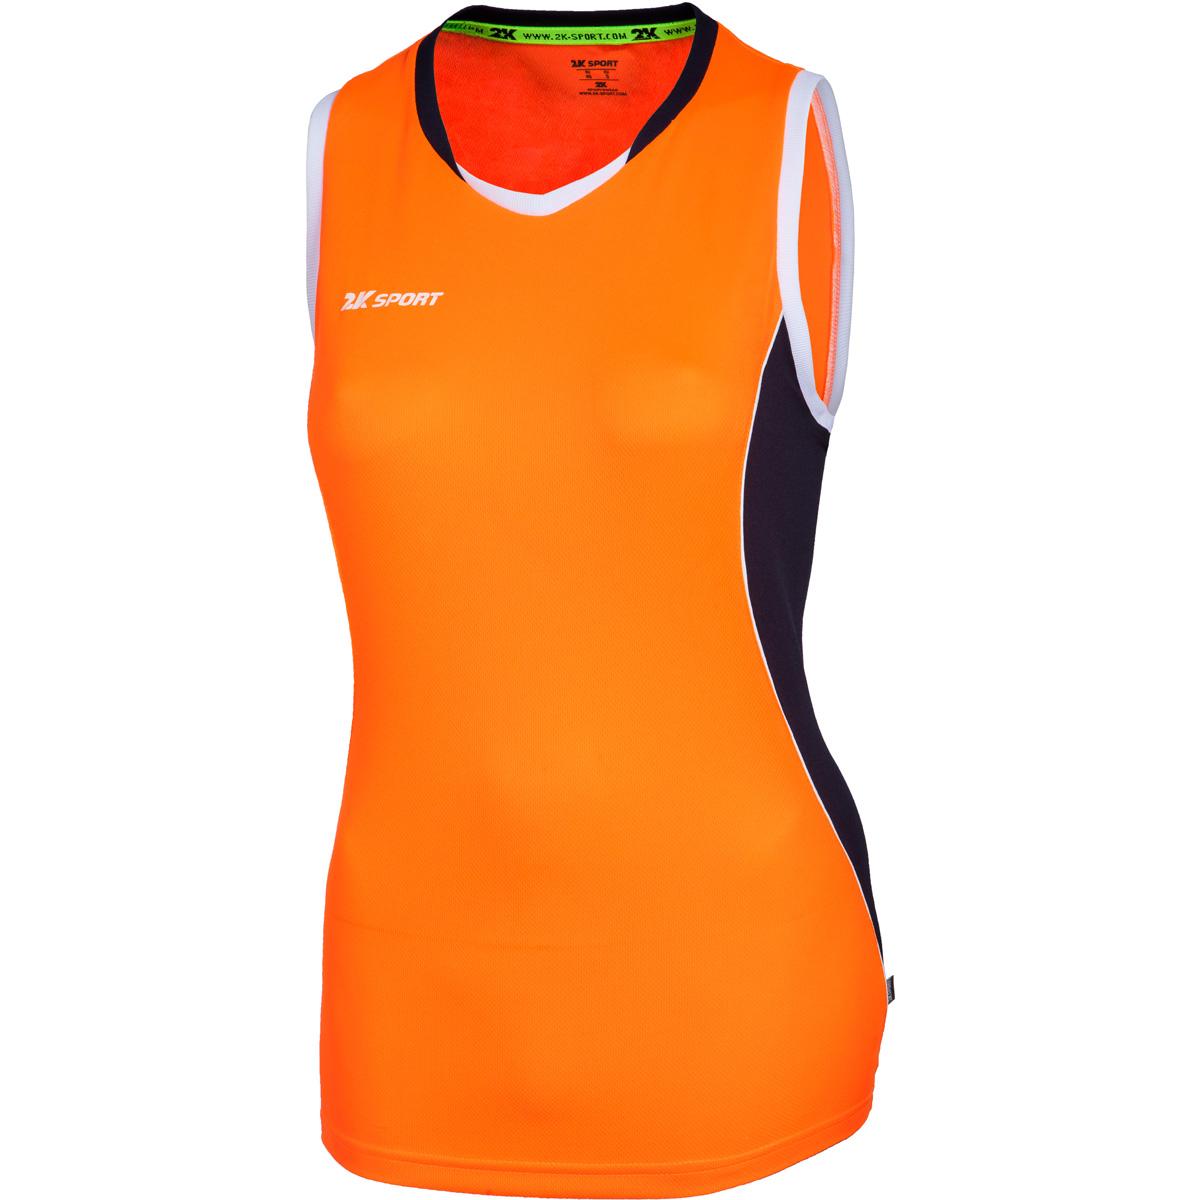 Майка баскетбольная женская 2K Sport Advance, цвет: оранжевый, темно-синий, белый. 130032. Размер XS (40/42) - Баскетбол